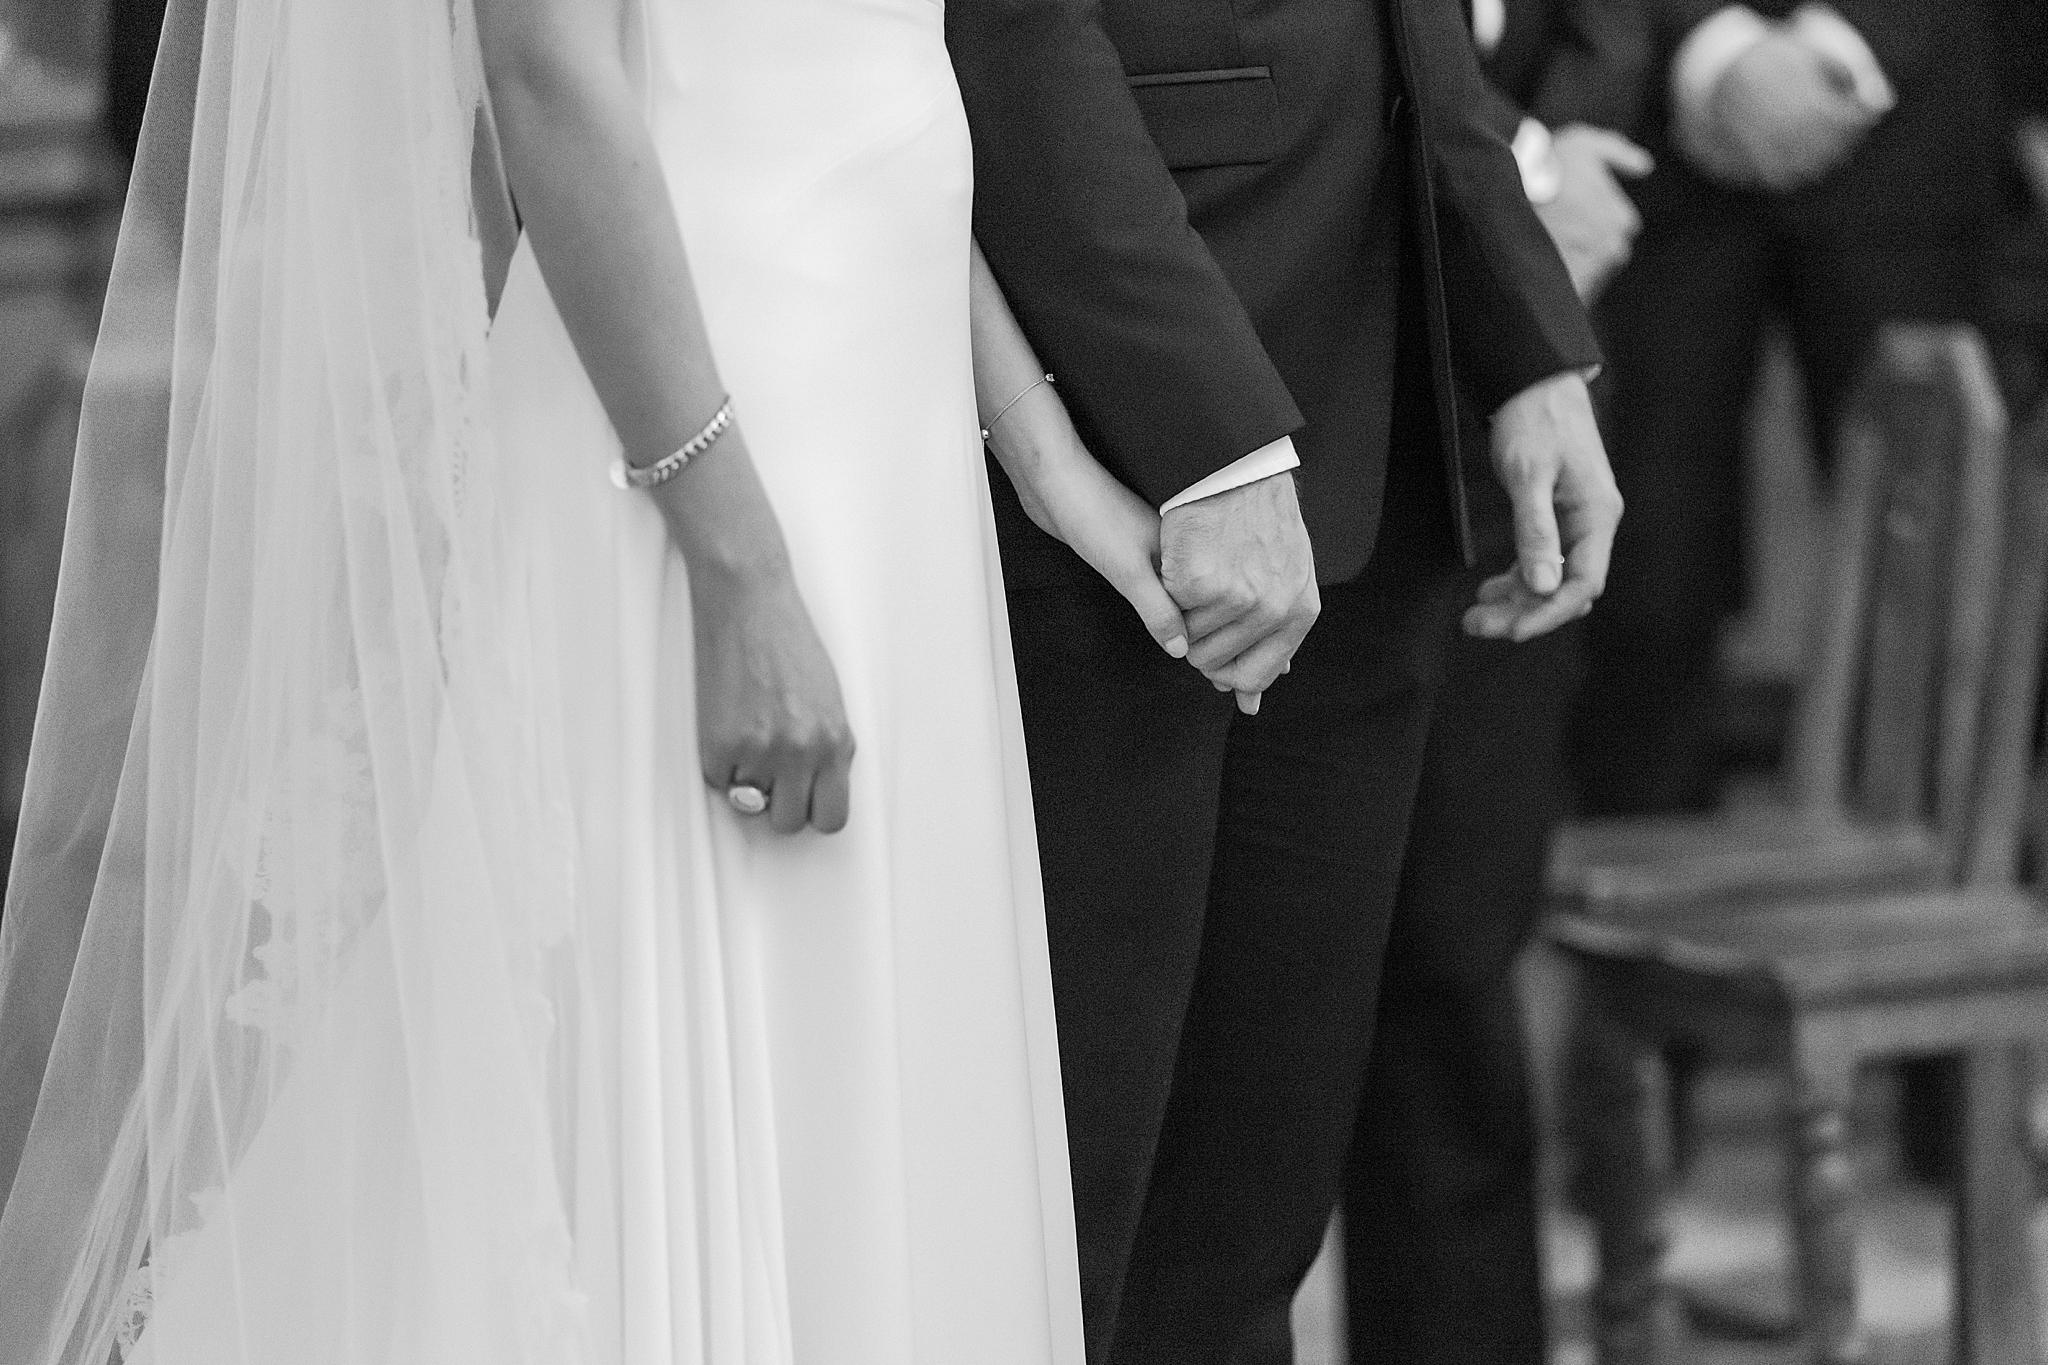 detroit-wedding-photographer-grosse-pointe-academy-chapel-detroit-golf-club-wedding-carly-matt-by-courtney-carolyn-photography_0039.jpg